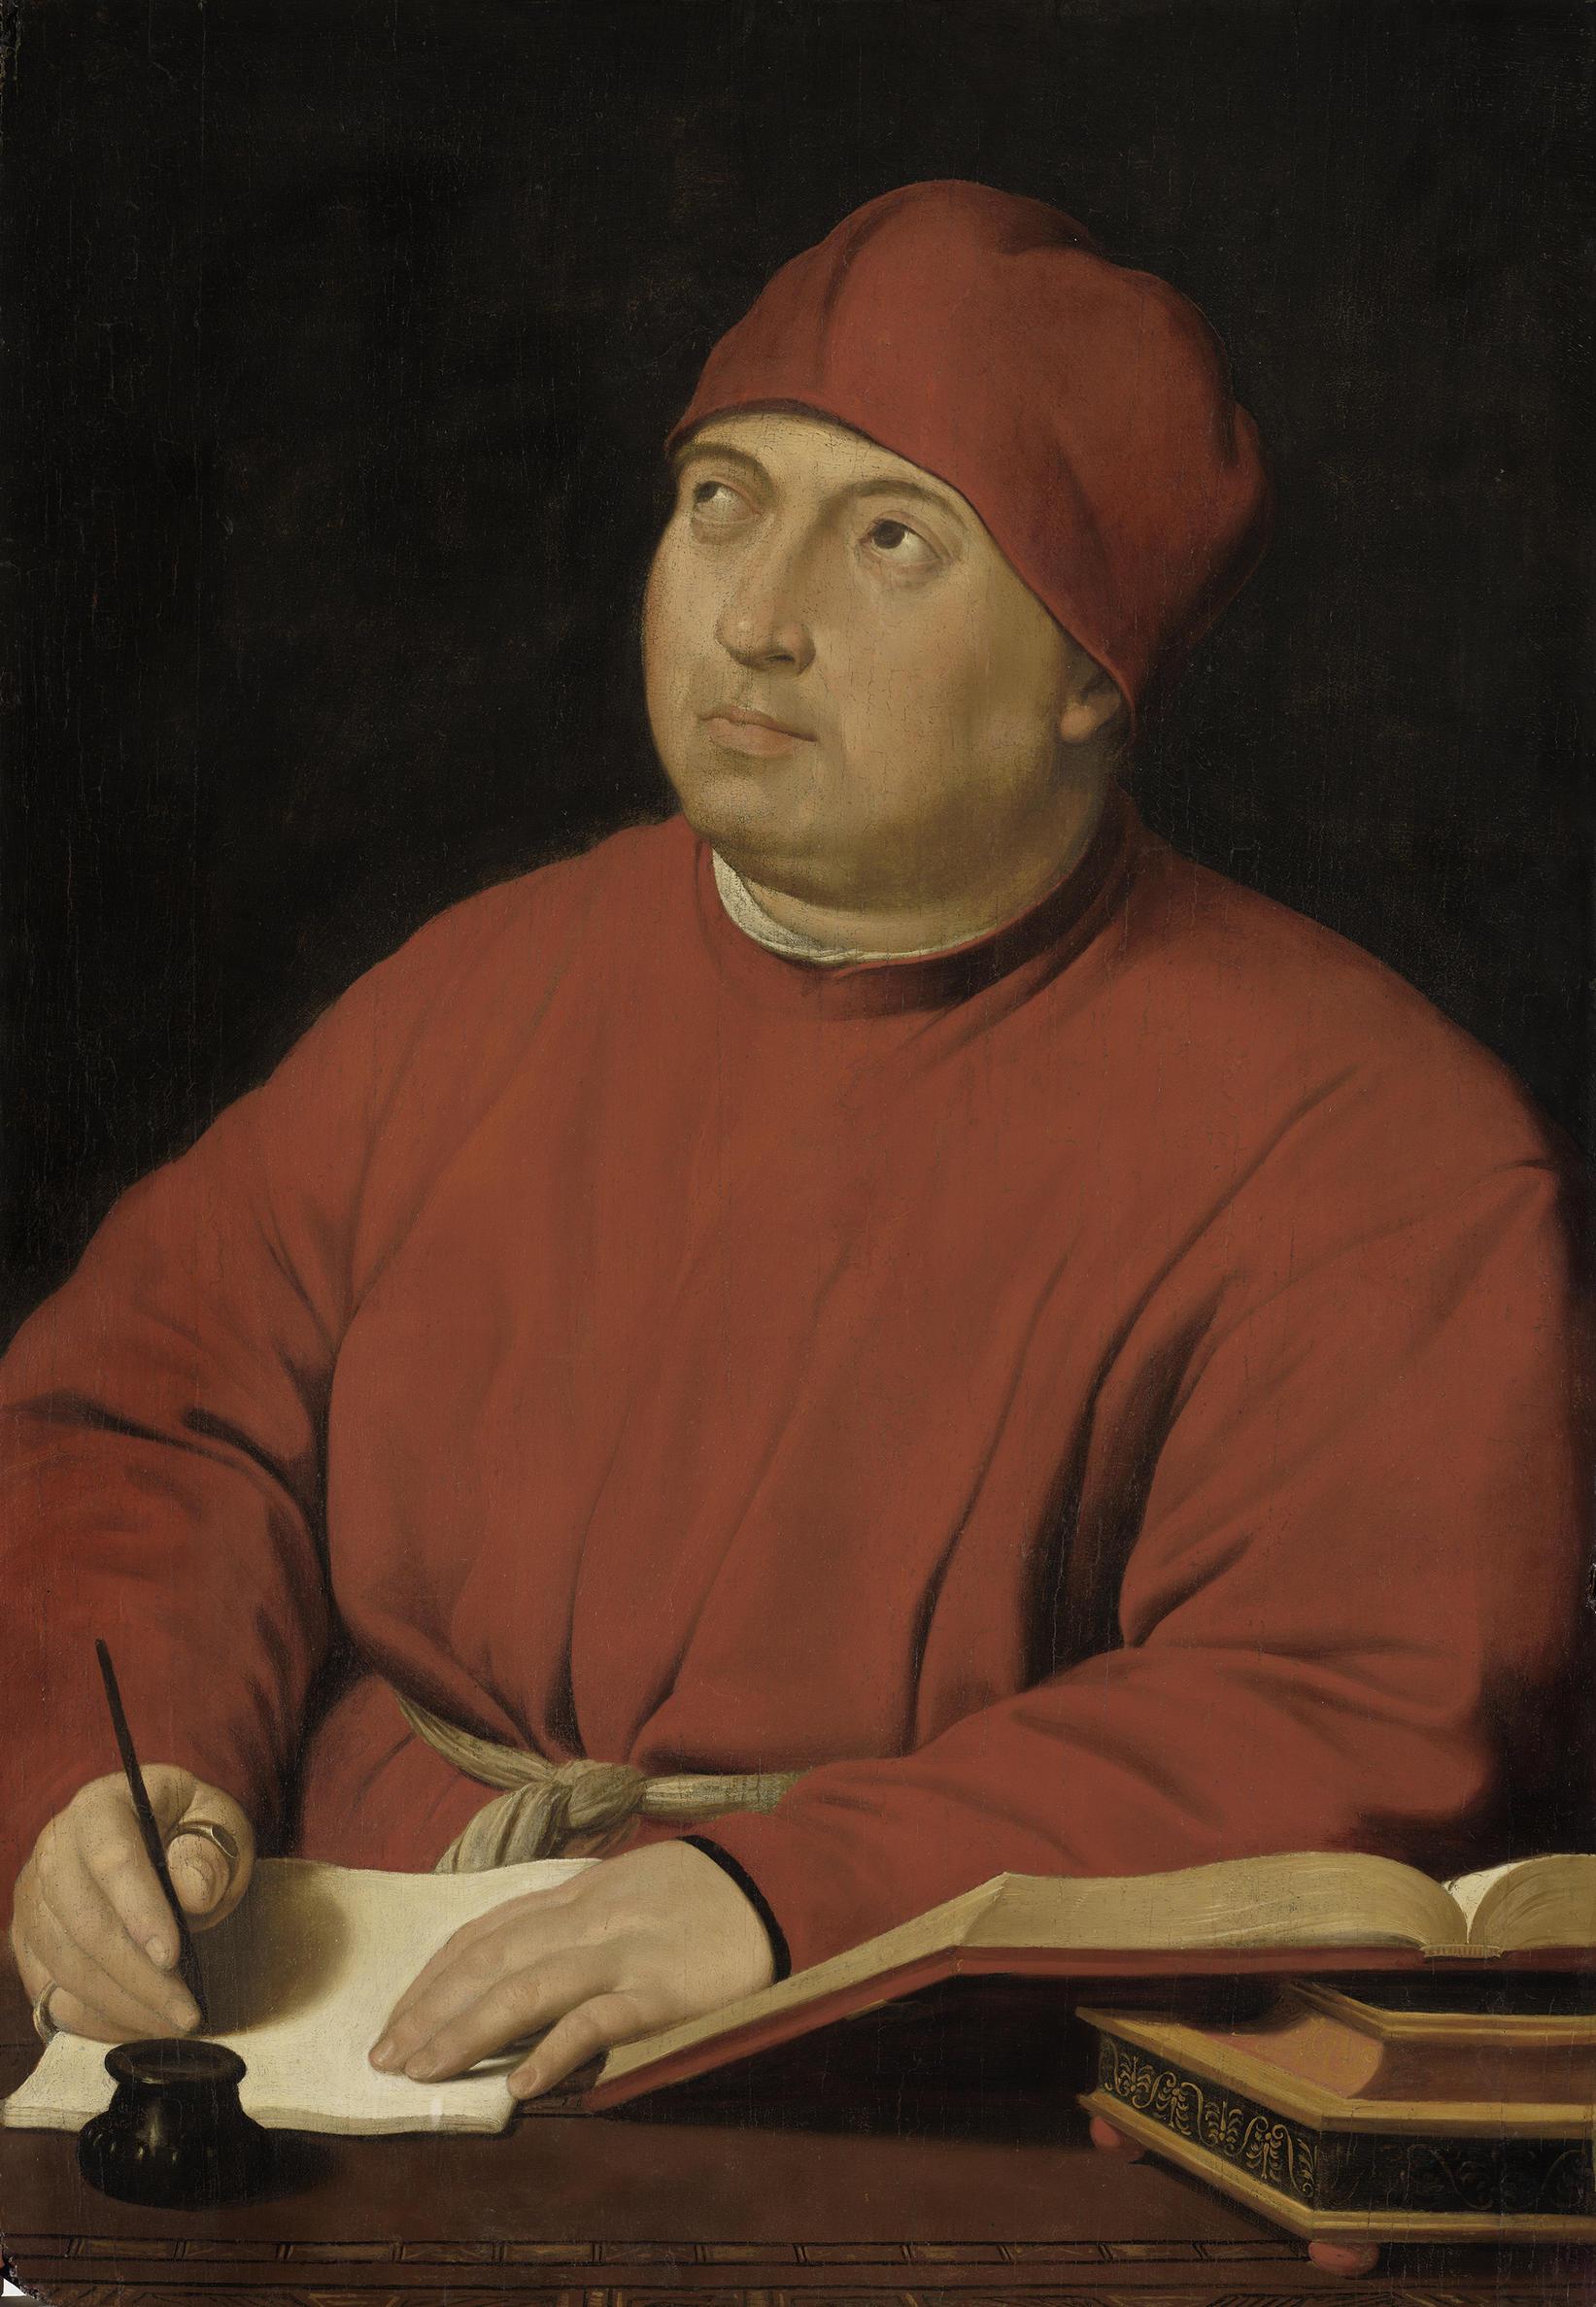 Raphael (Italian, 1483-1520), Tommaso Inghirami, about 1510